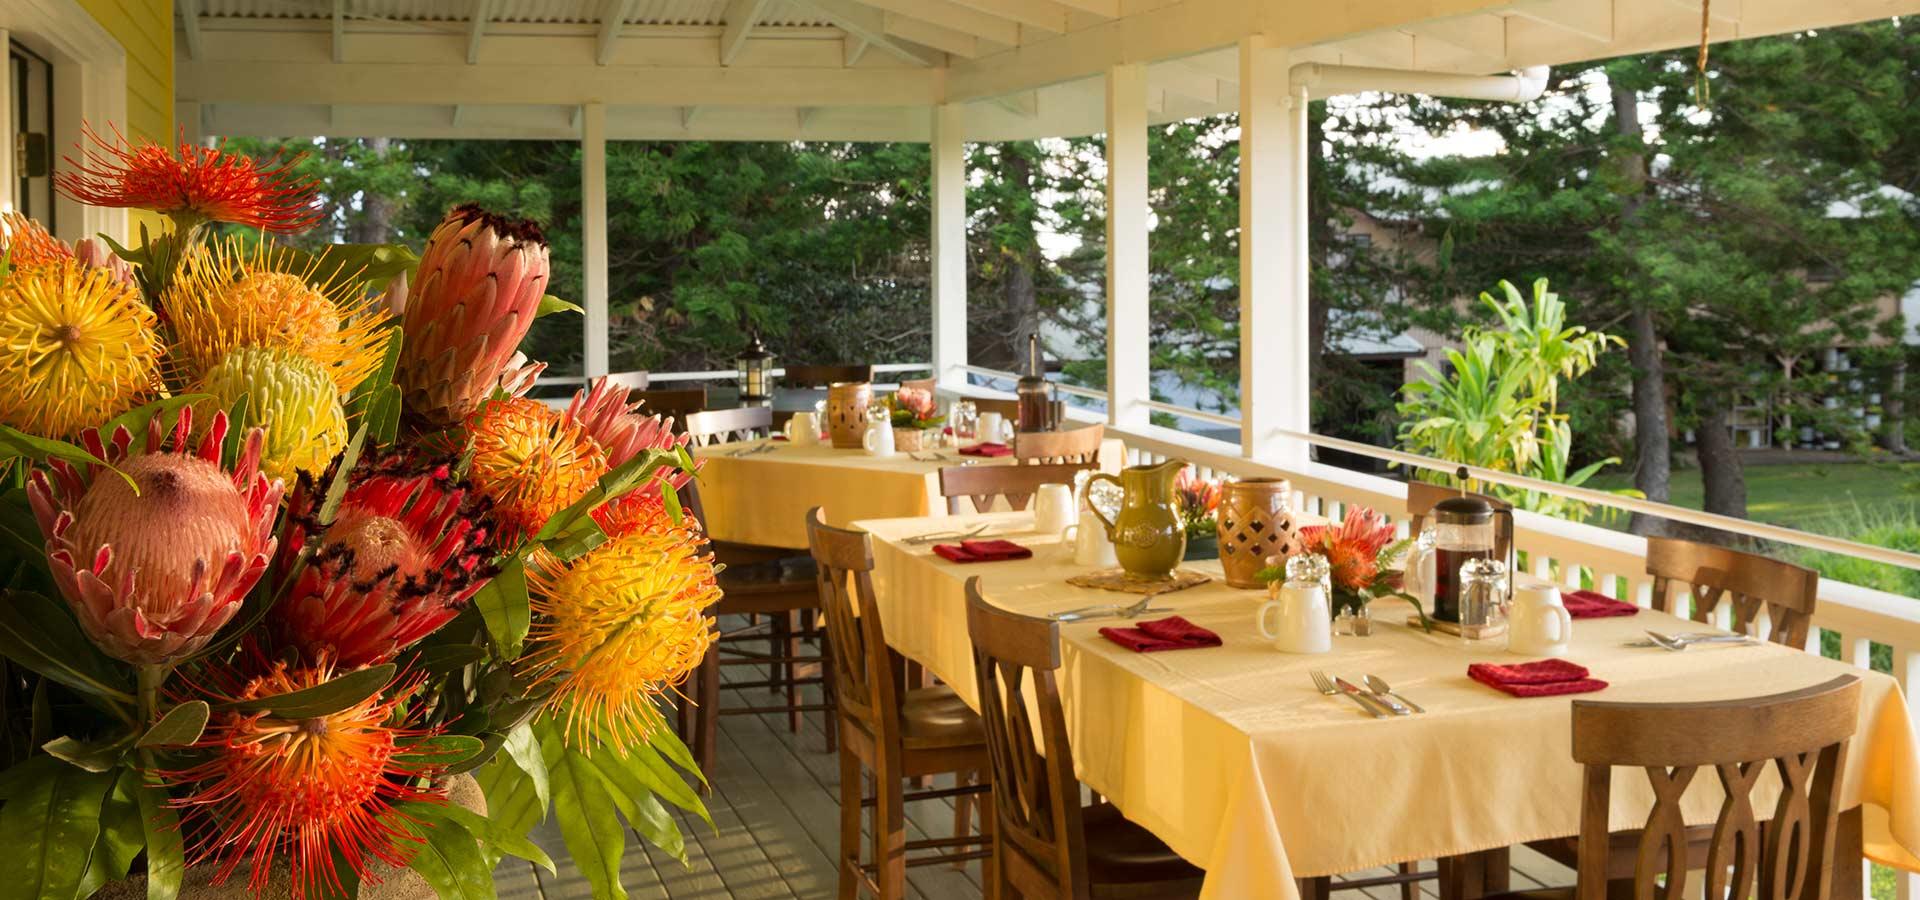 Lanai Breakfast Table at Kalaekilohana Inn and Retreat - Na`alehu, Hawaii